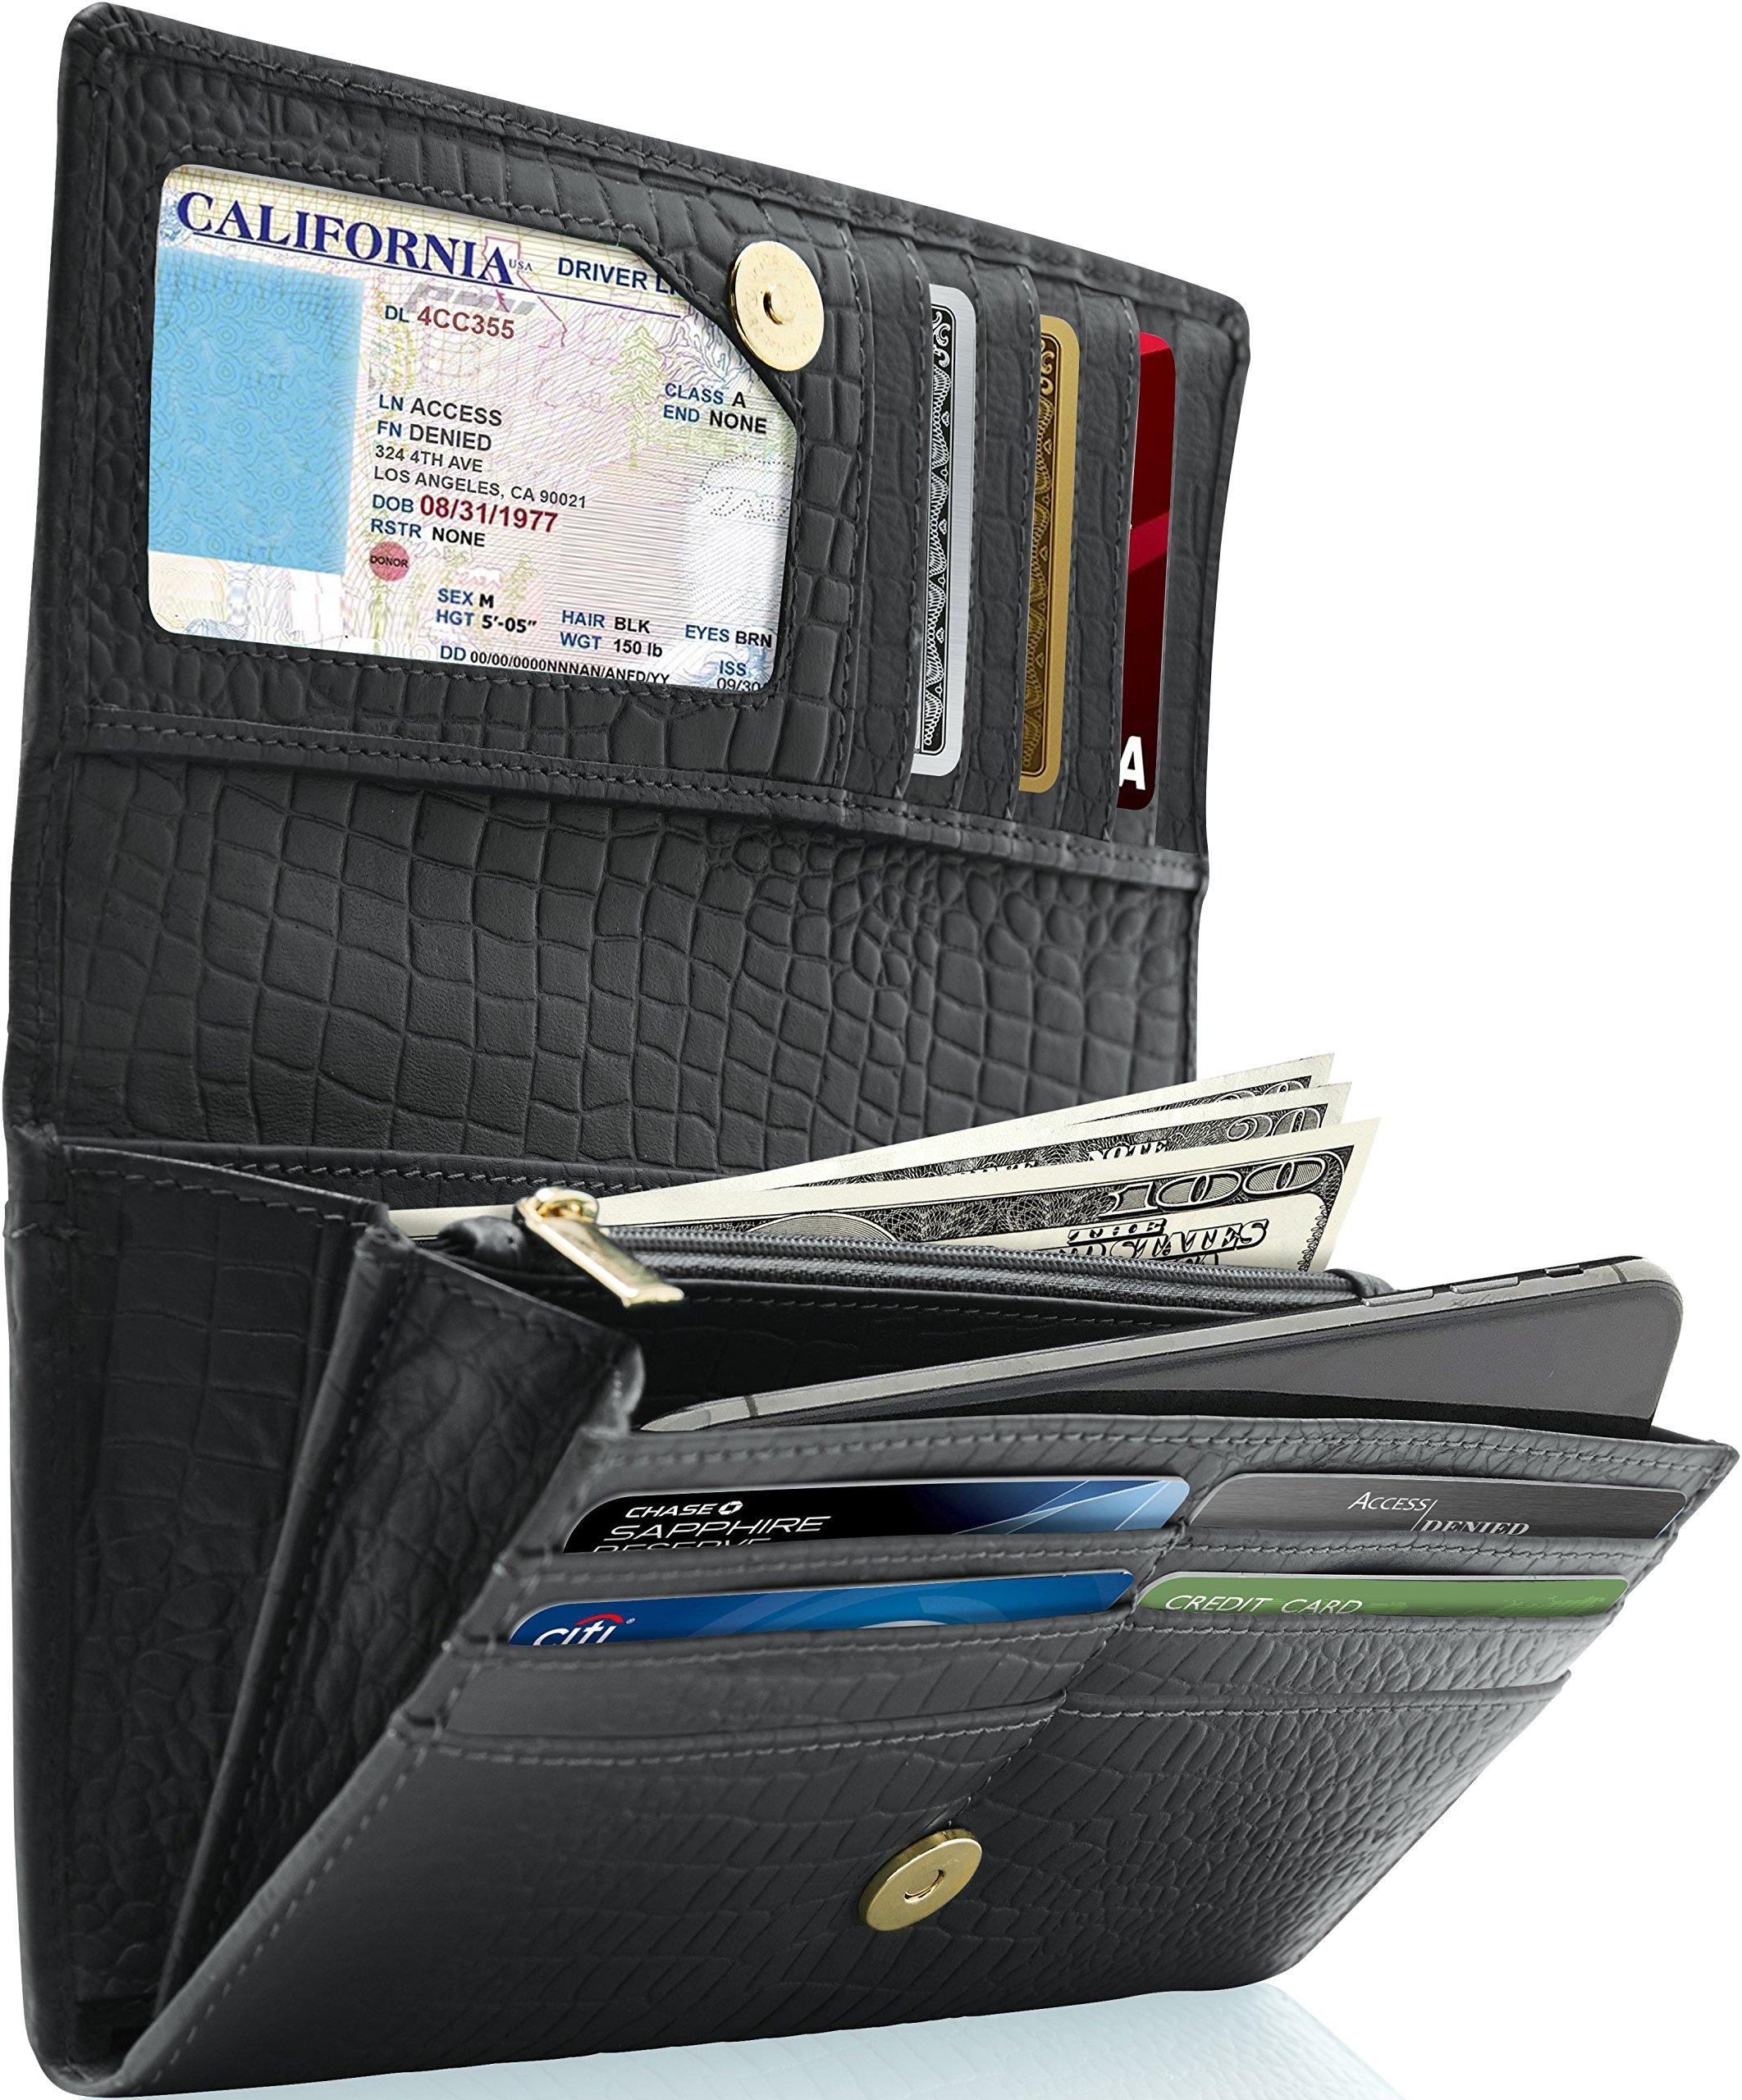 Leather Clutch Wallets For Women - Ladies Accordion Organizer RFID Blocking Wallet